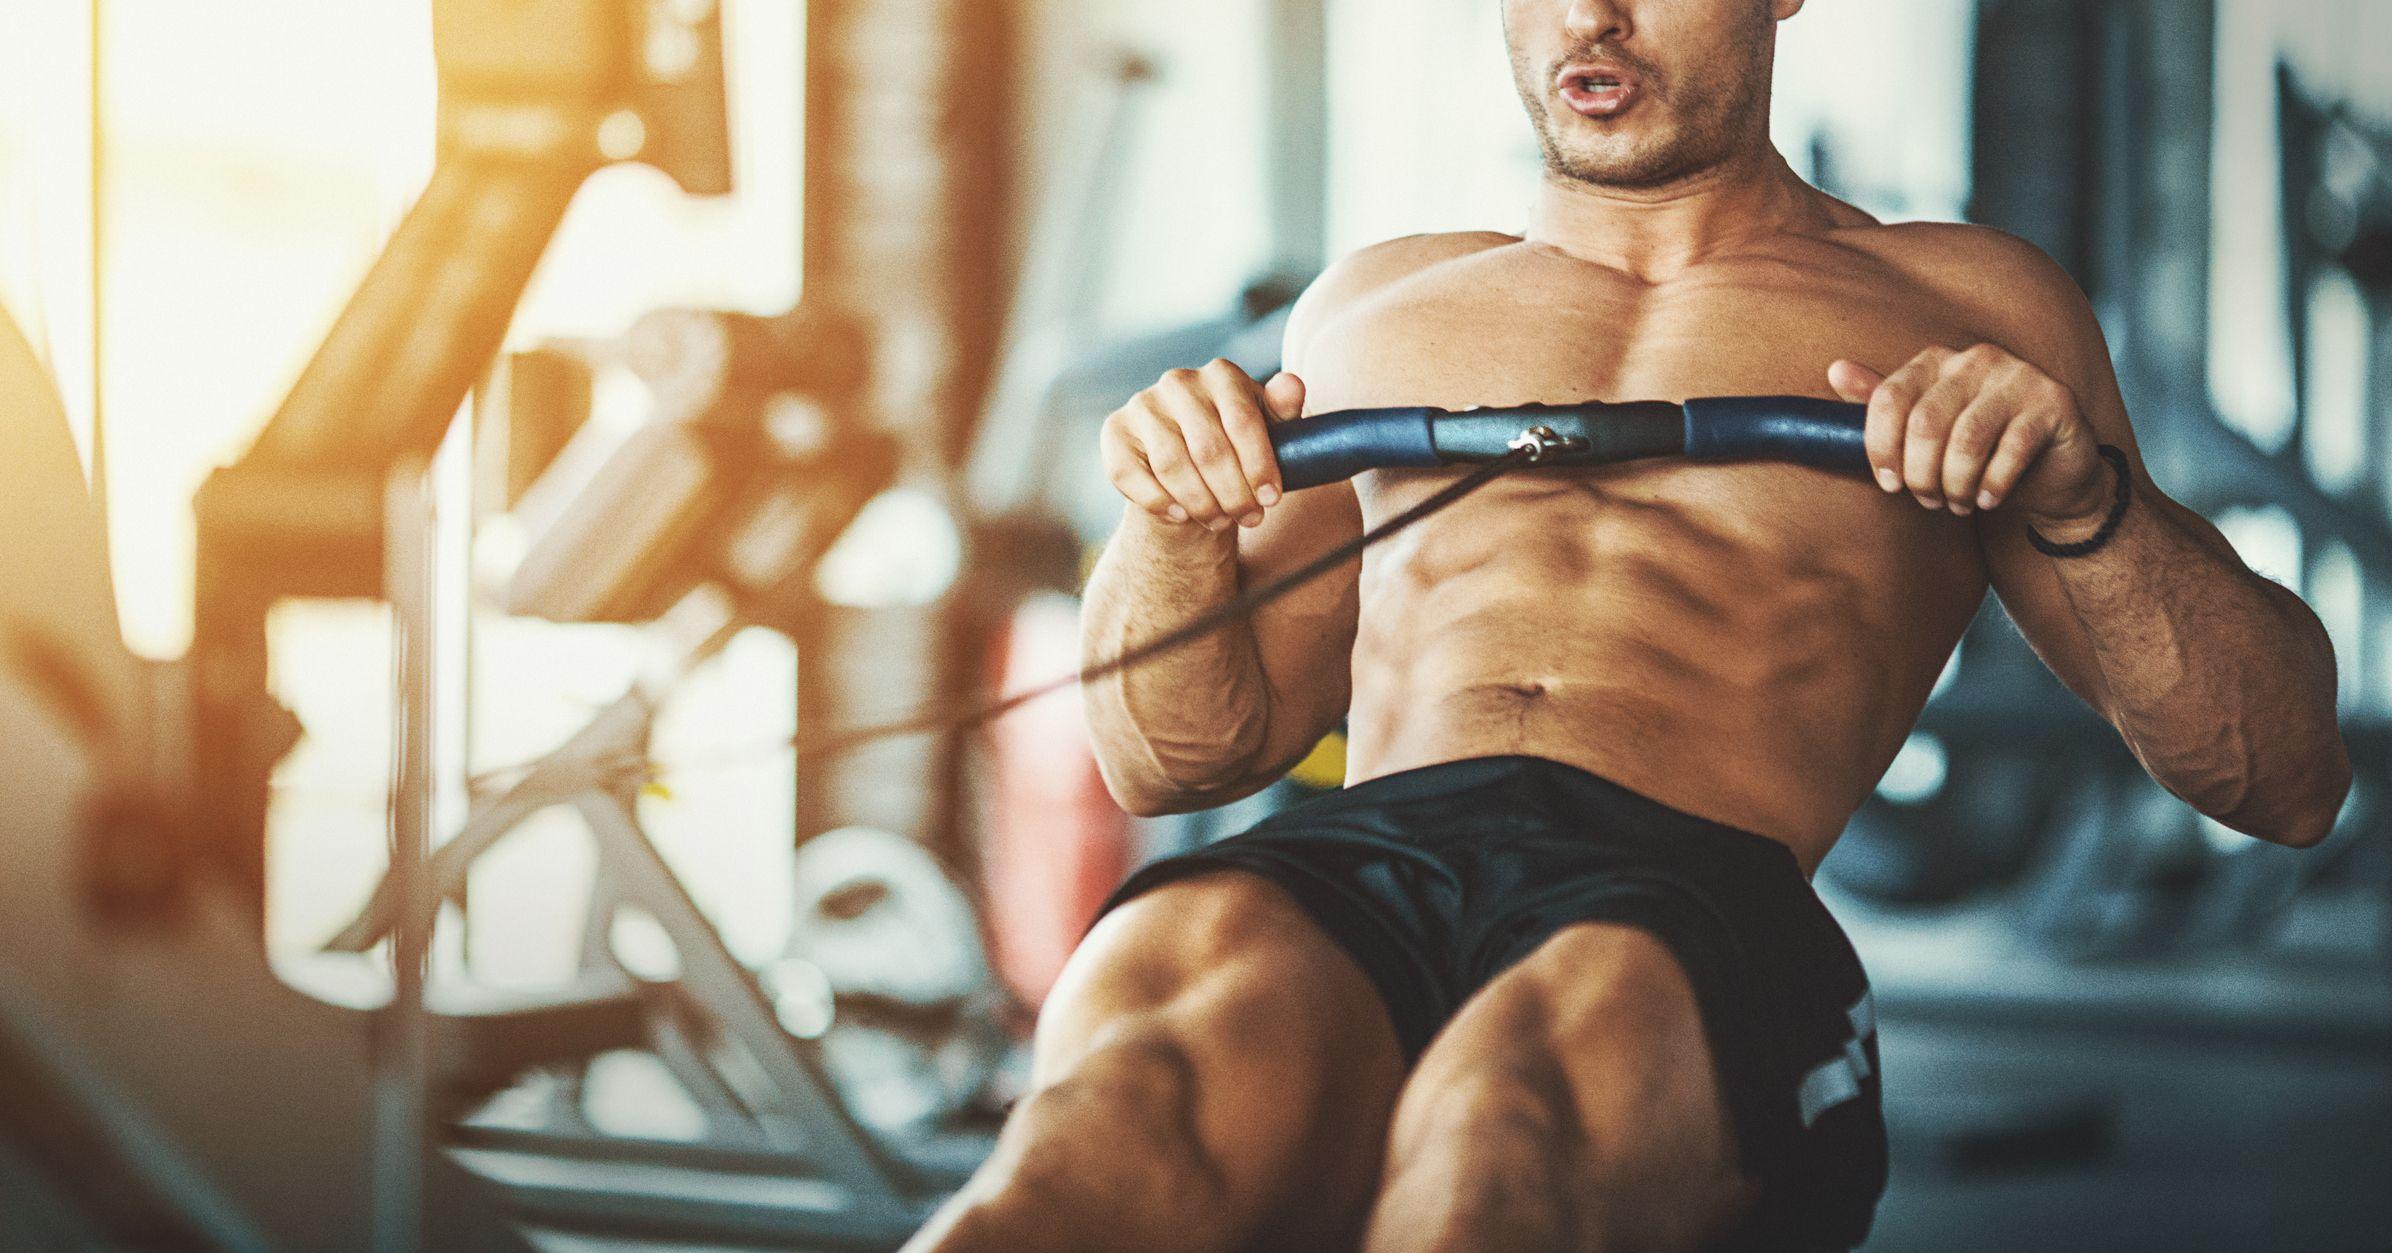 que hacer para adelgazar rapido sin dieta forte